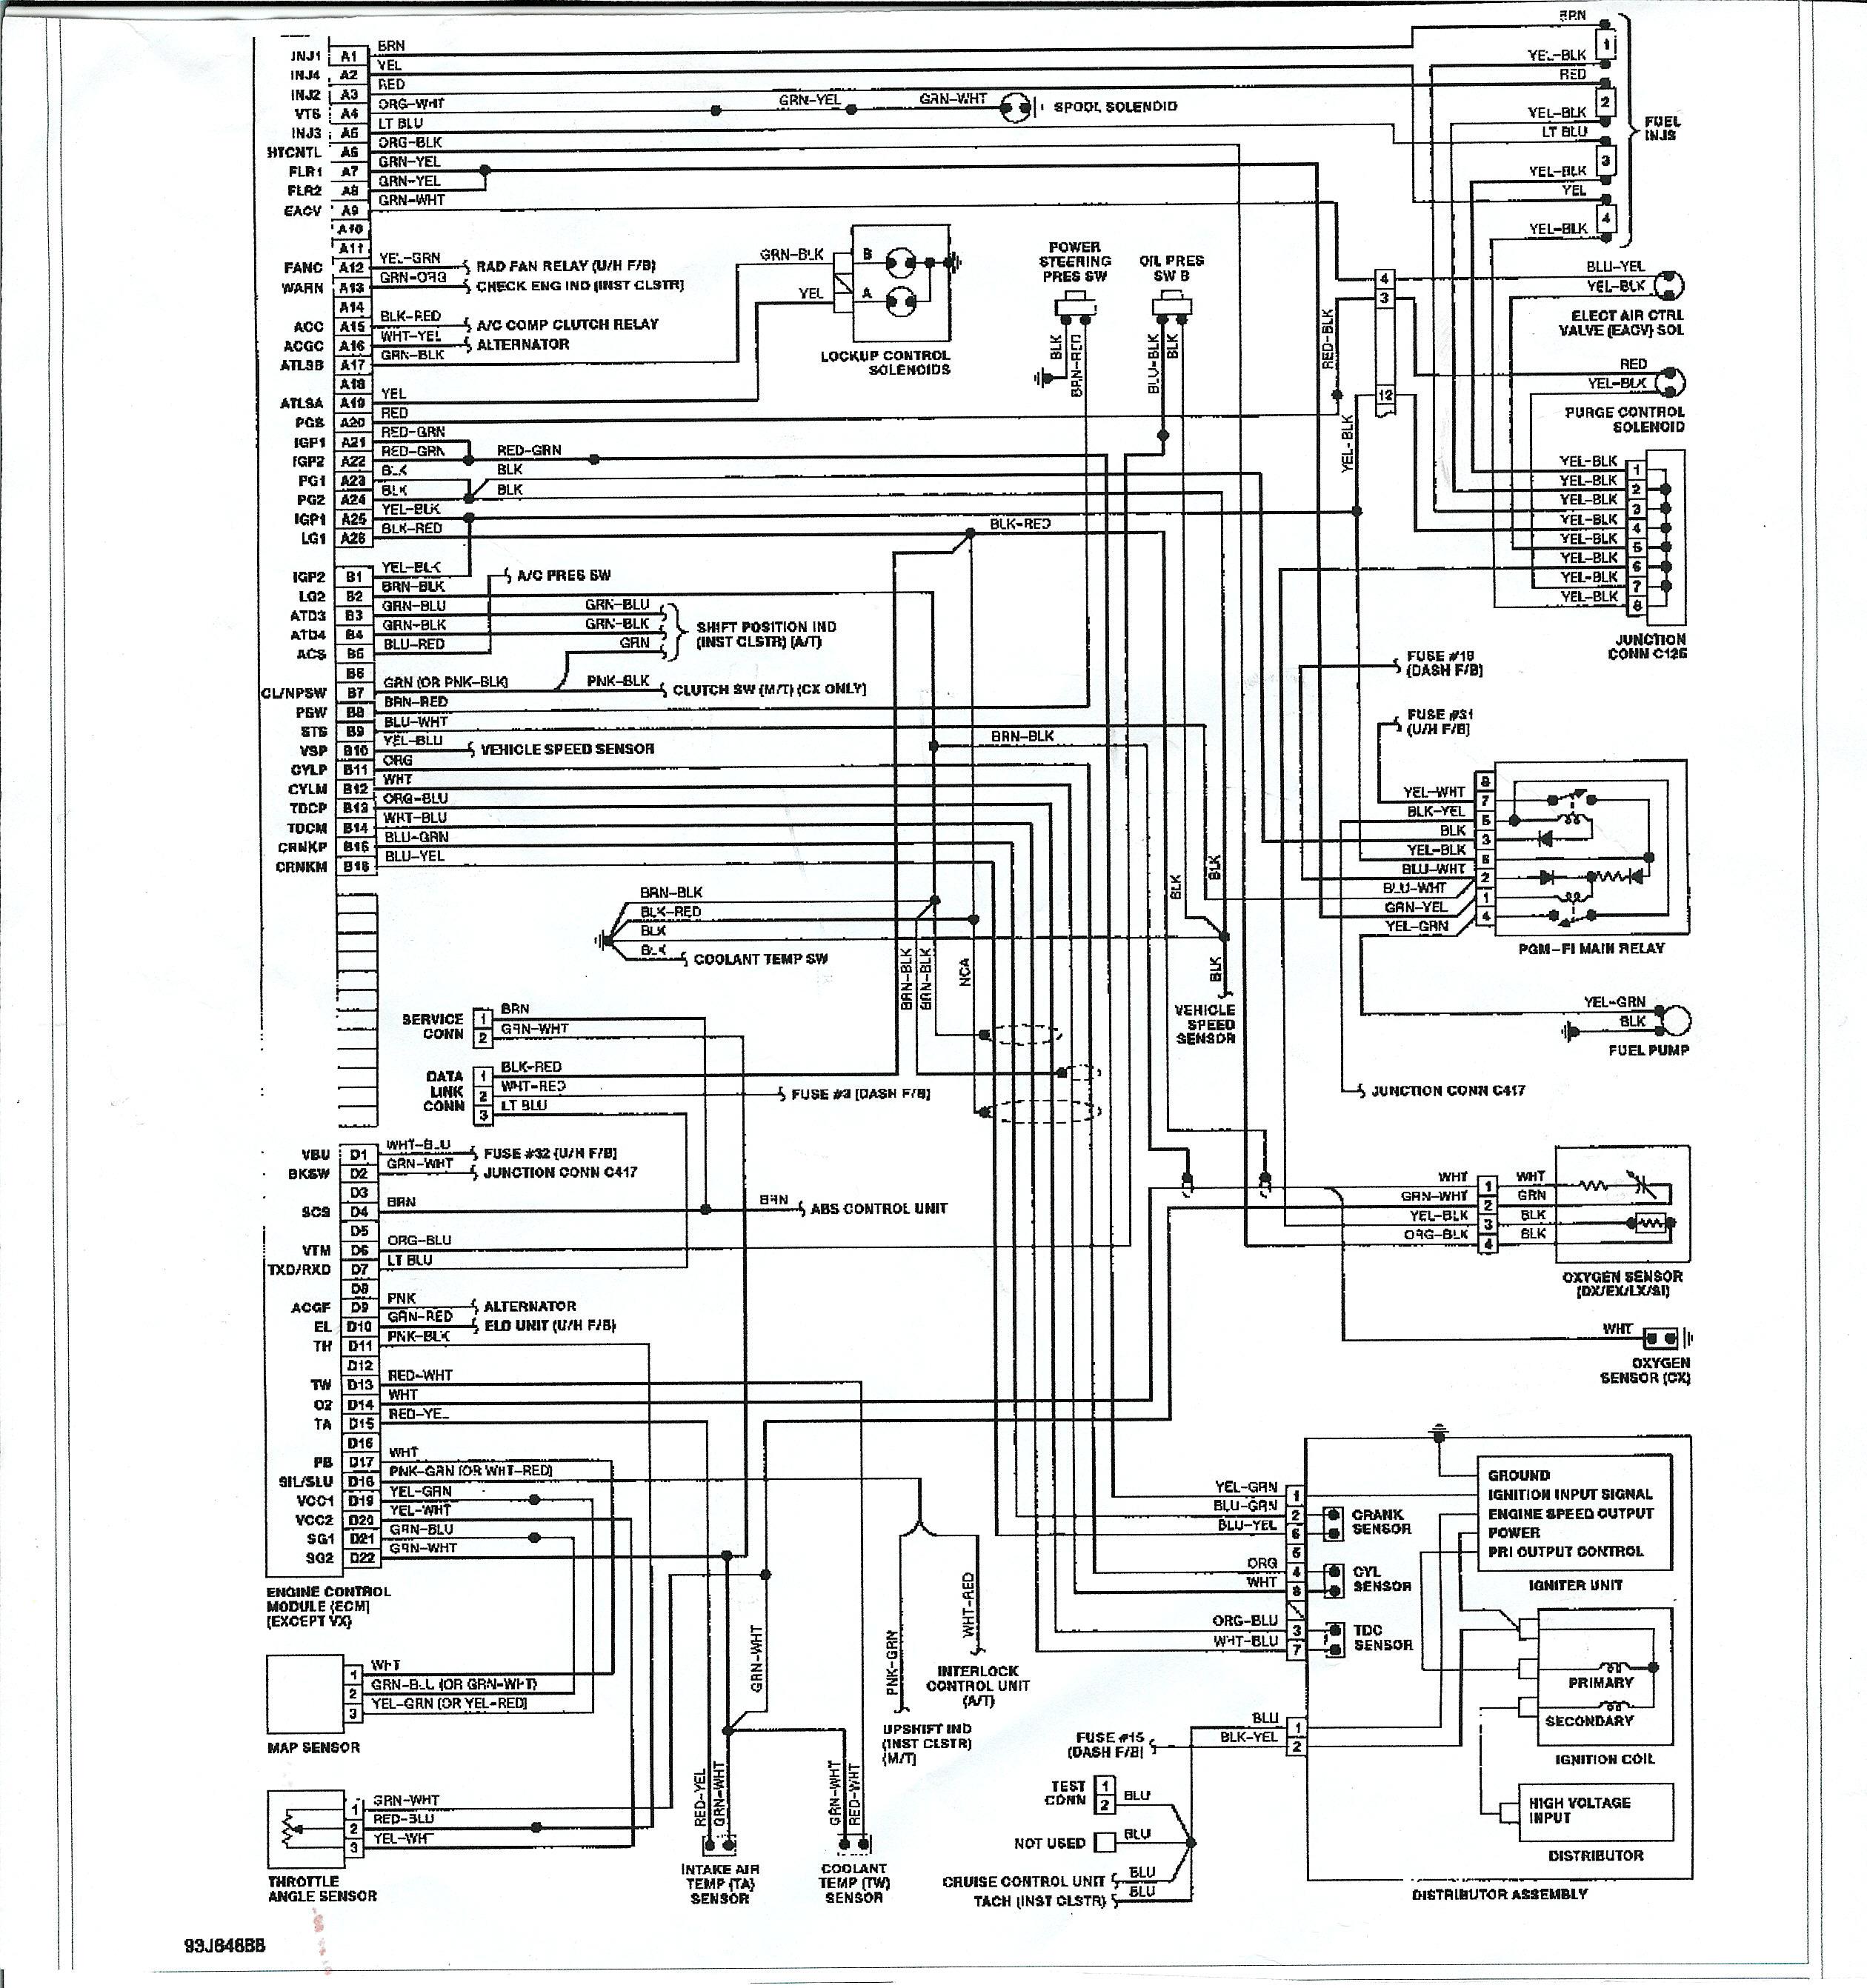 1997 chevy 1500 wiring diagrams with Speaker Wiring Diagram 97 Honda Civic on 2g Gs T Fwd Gsx Awd Fuel Pump Rewire Diagram likewise 96 Pontiac Sunfire Engine Diagram besides 232 as well Mopar performance dodge truck magnum interior furthermore 2002 Chevy Tracker 2 0l 2 5l Serpentine Belt Diagram.